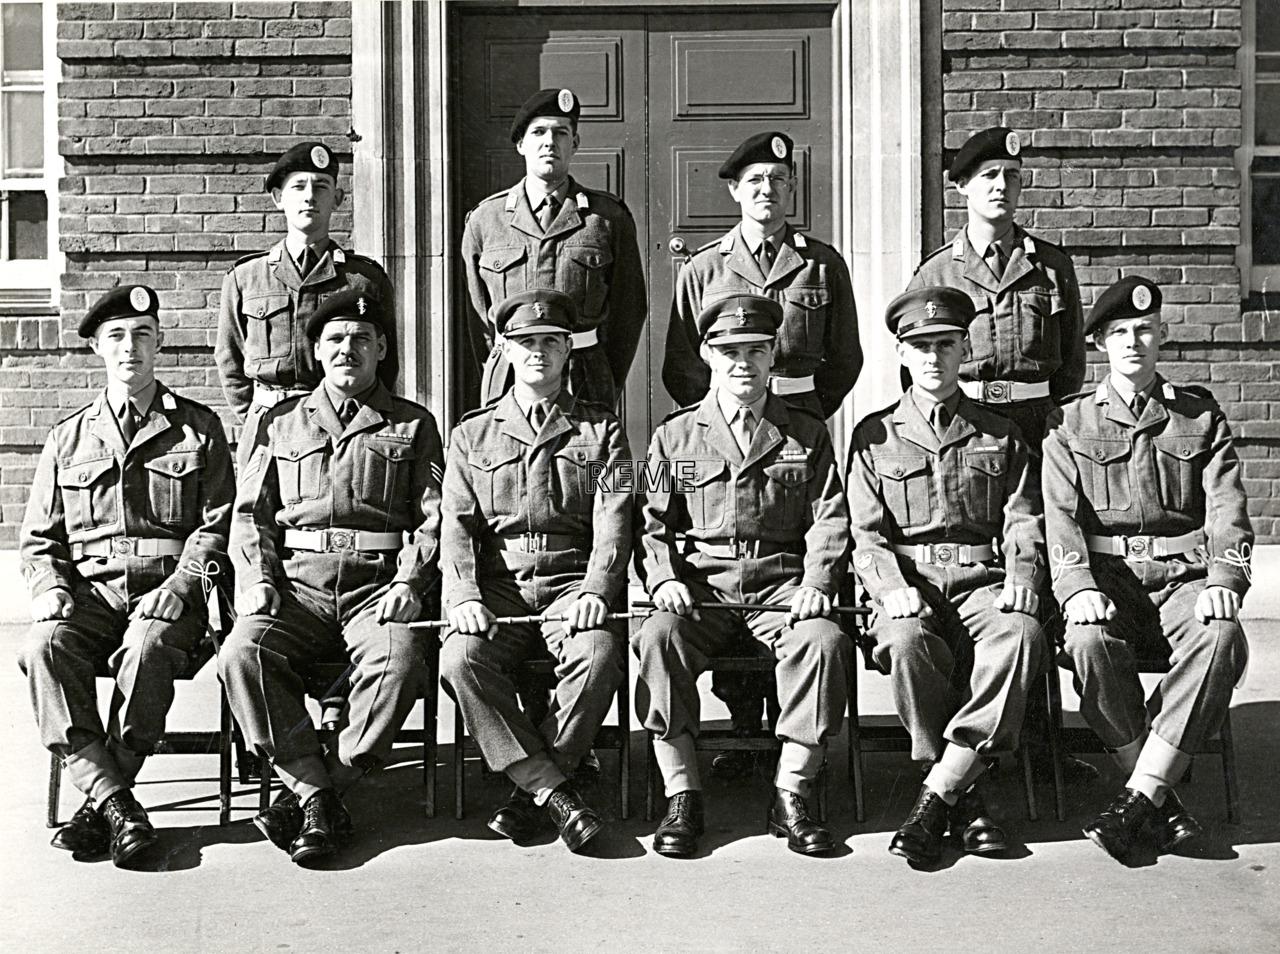 No 52 Cadet Officer General Course, Bordon: September 1957